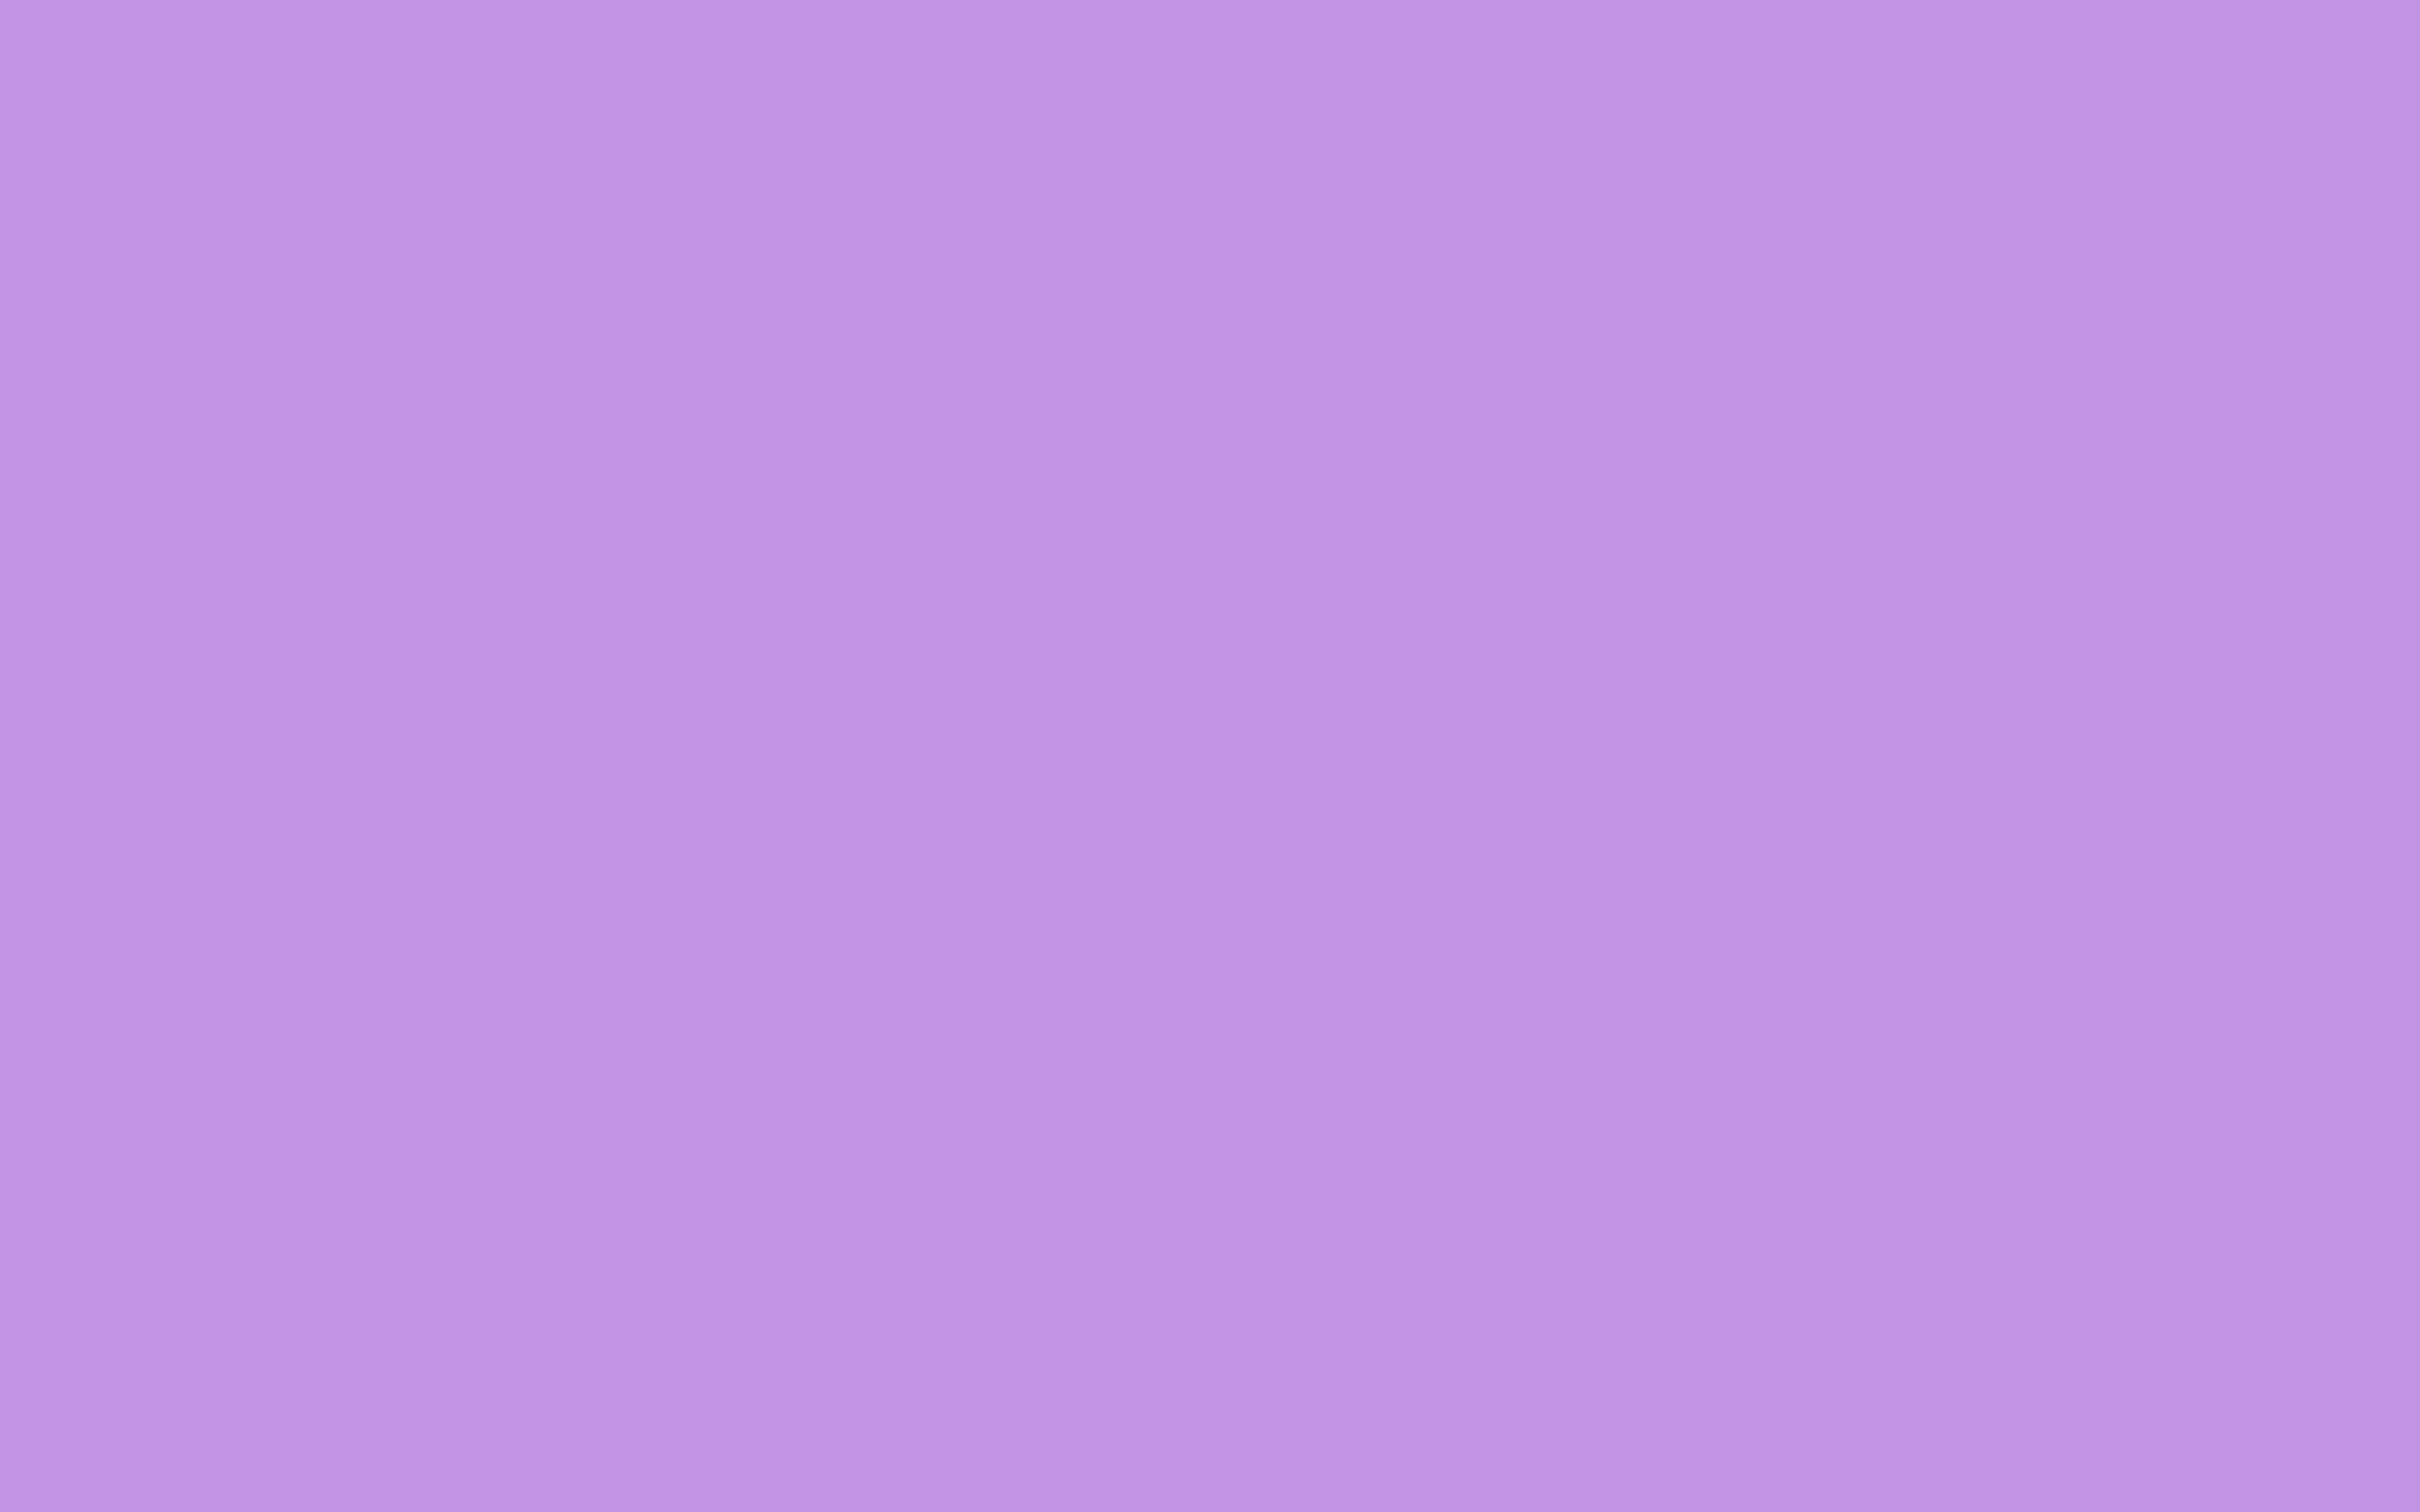 Light Purple Solid Color Wallpaper 975